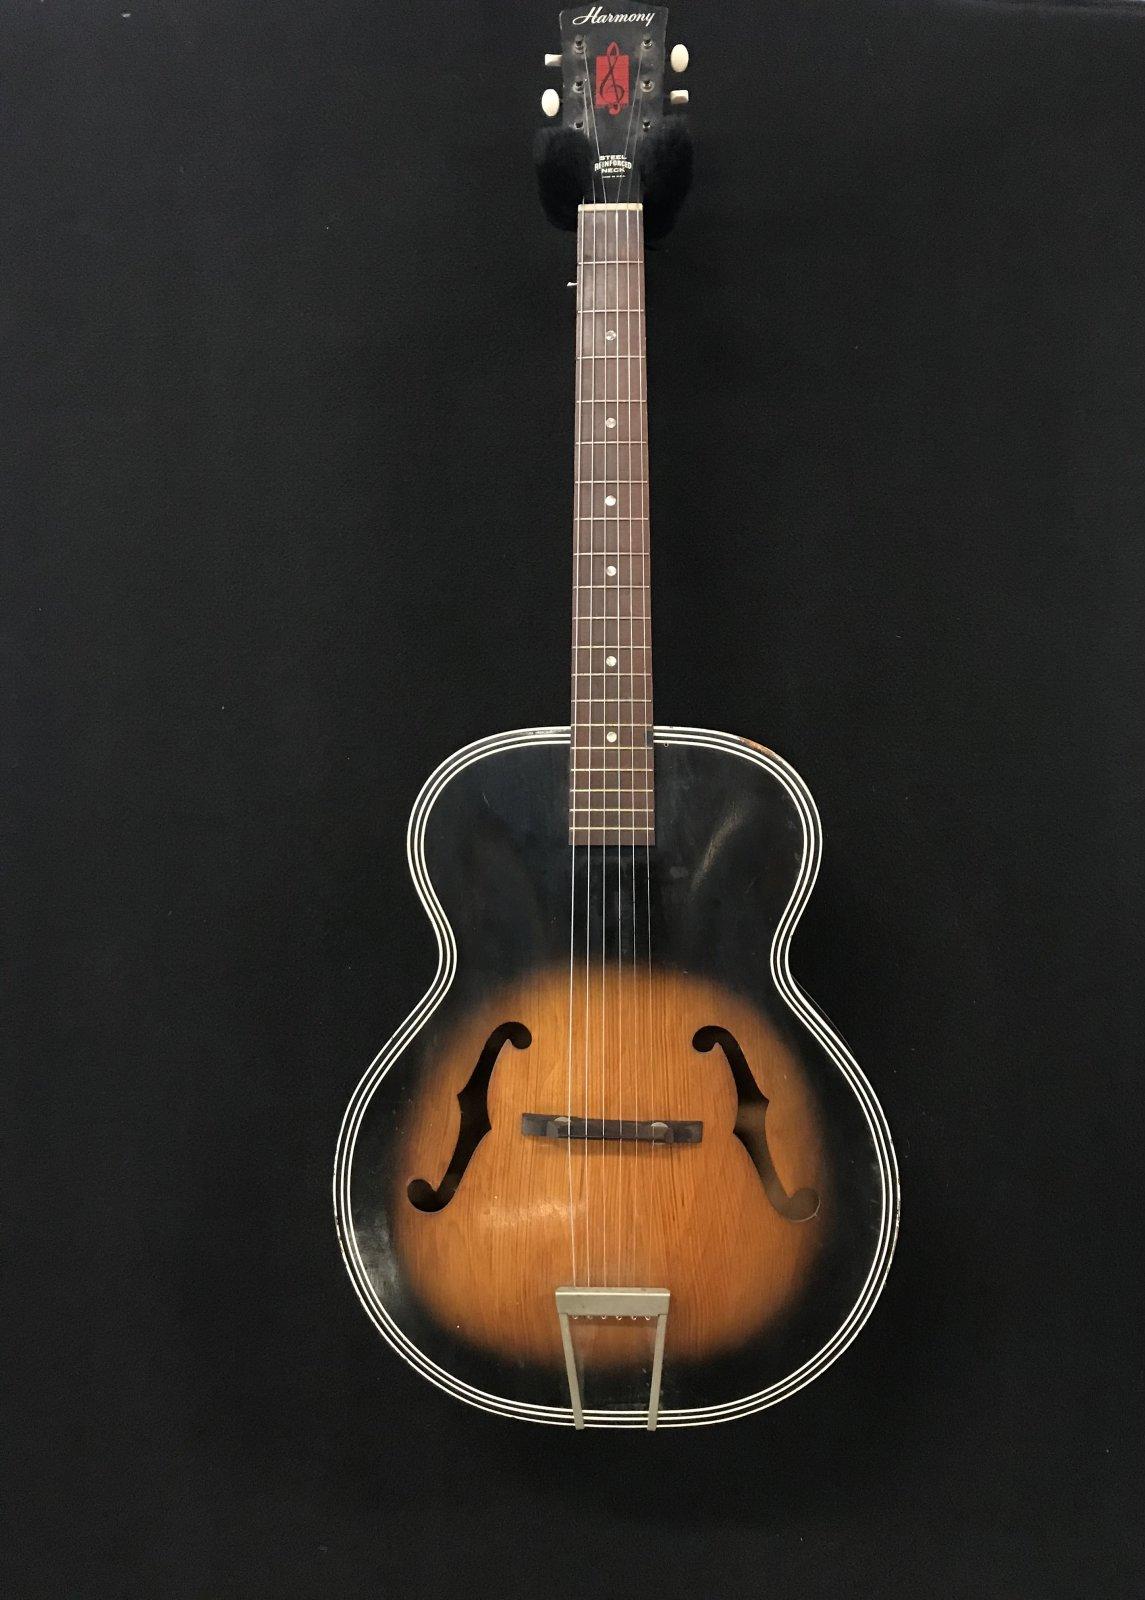 Harmony H-162